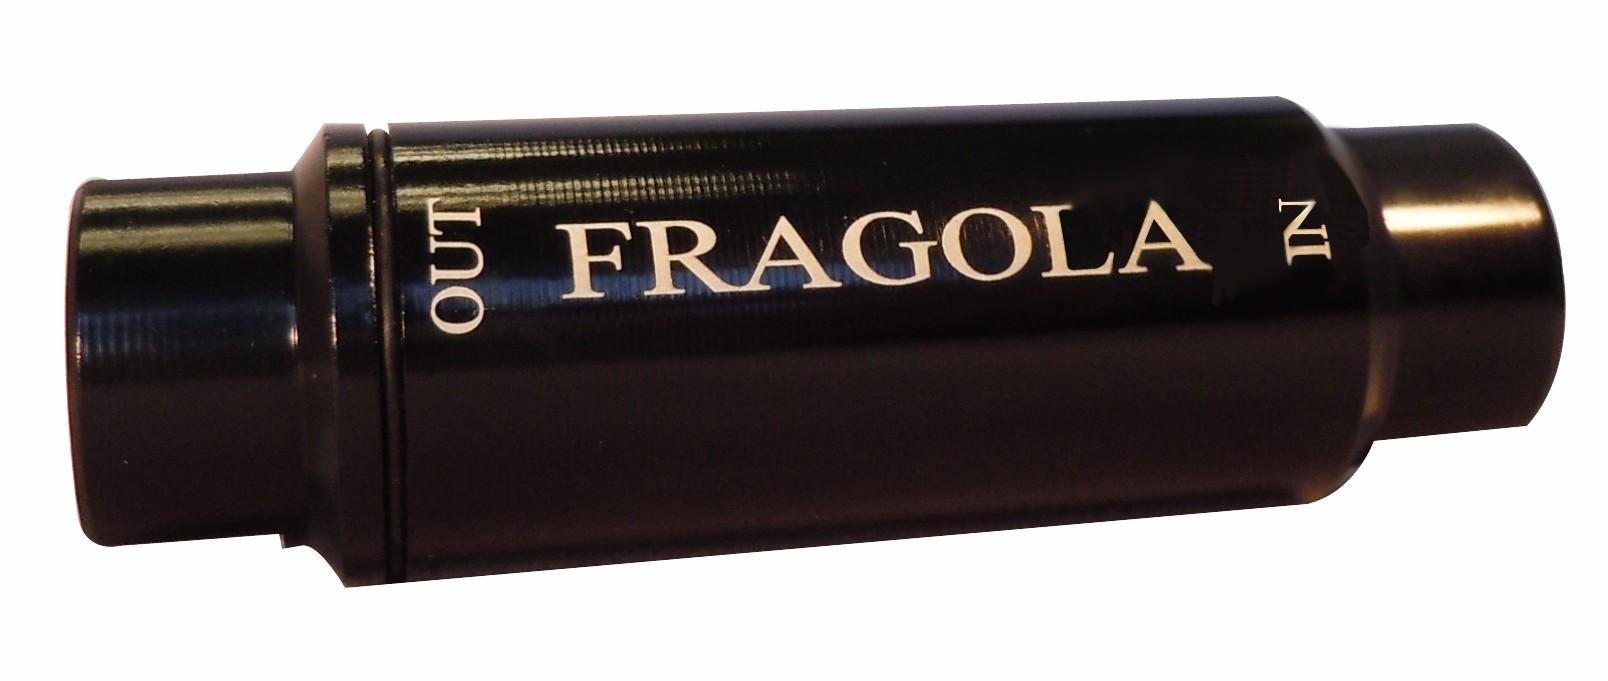 Fragola Fuel Filters Deez Performance Allstar Filter 960001 Bl